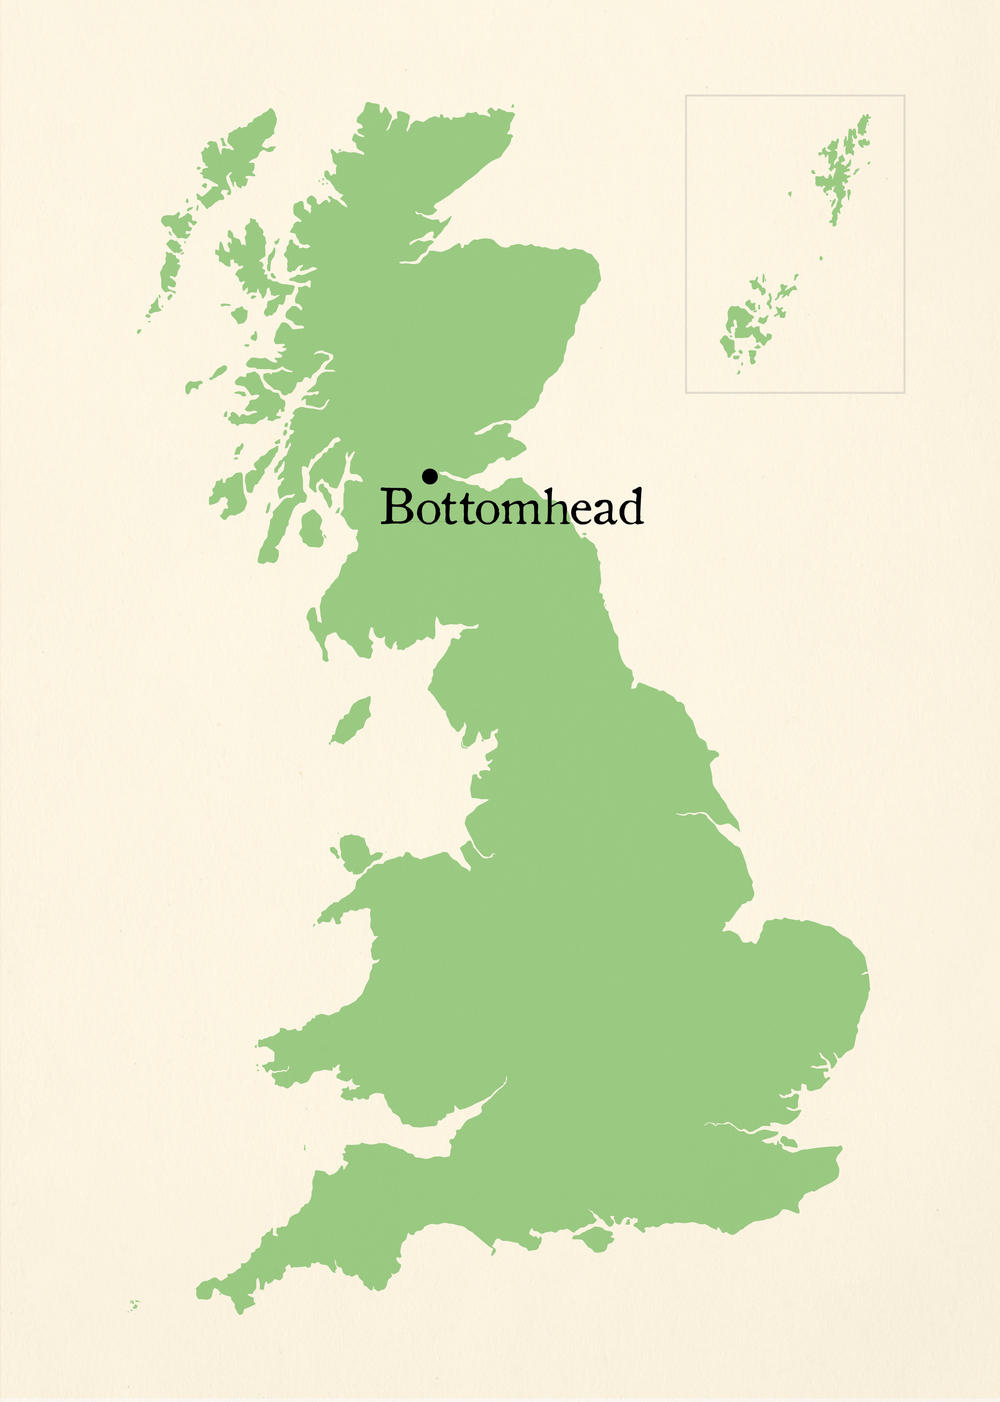 Bottomhead